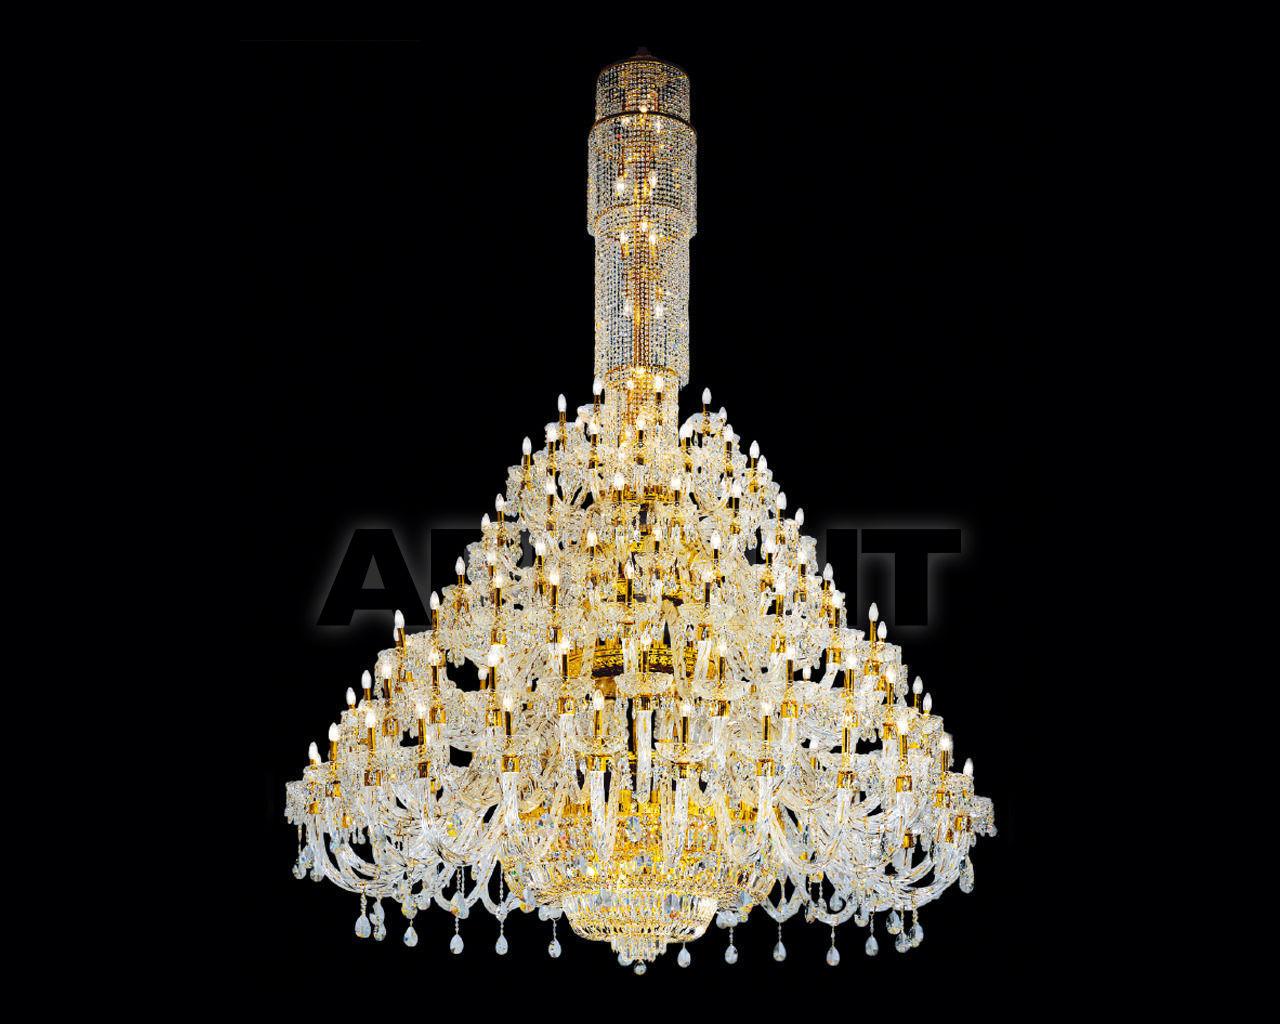 Купить Люстра Asfour Crystal Crystal 2013 CH 77/134 Gold Pear